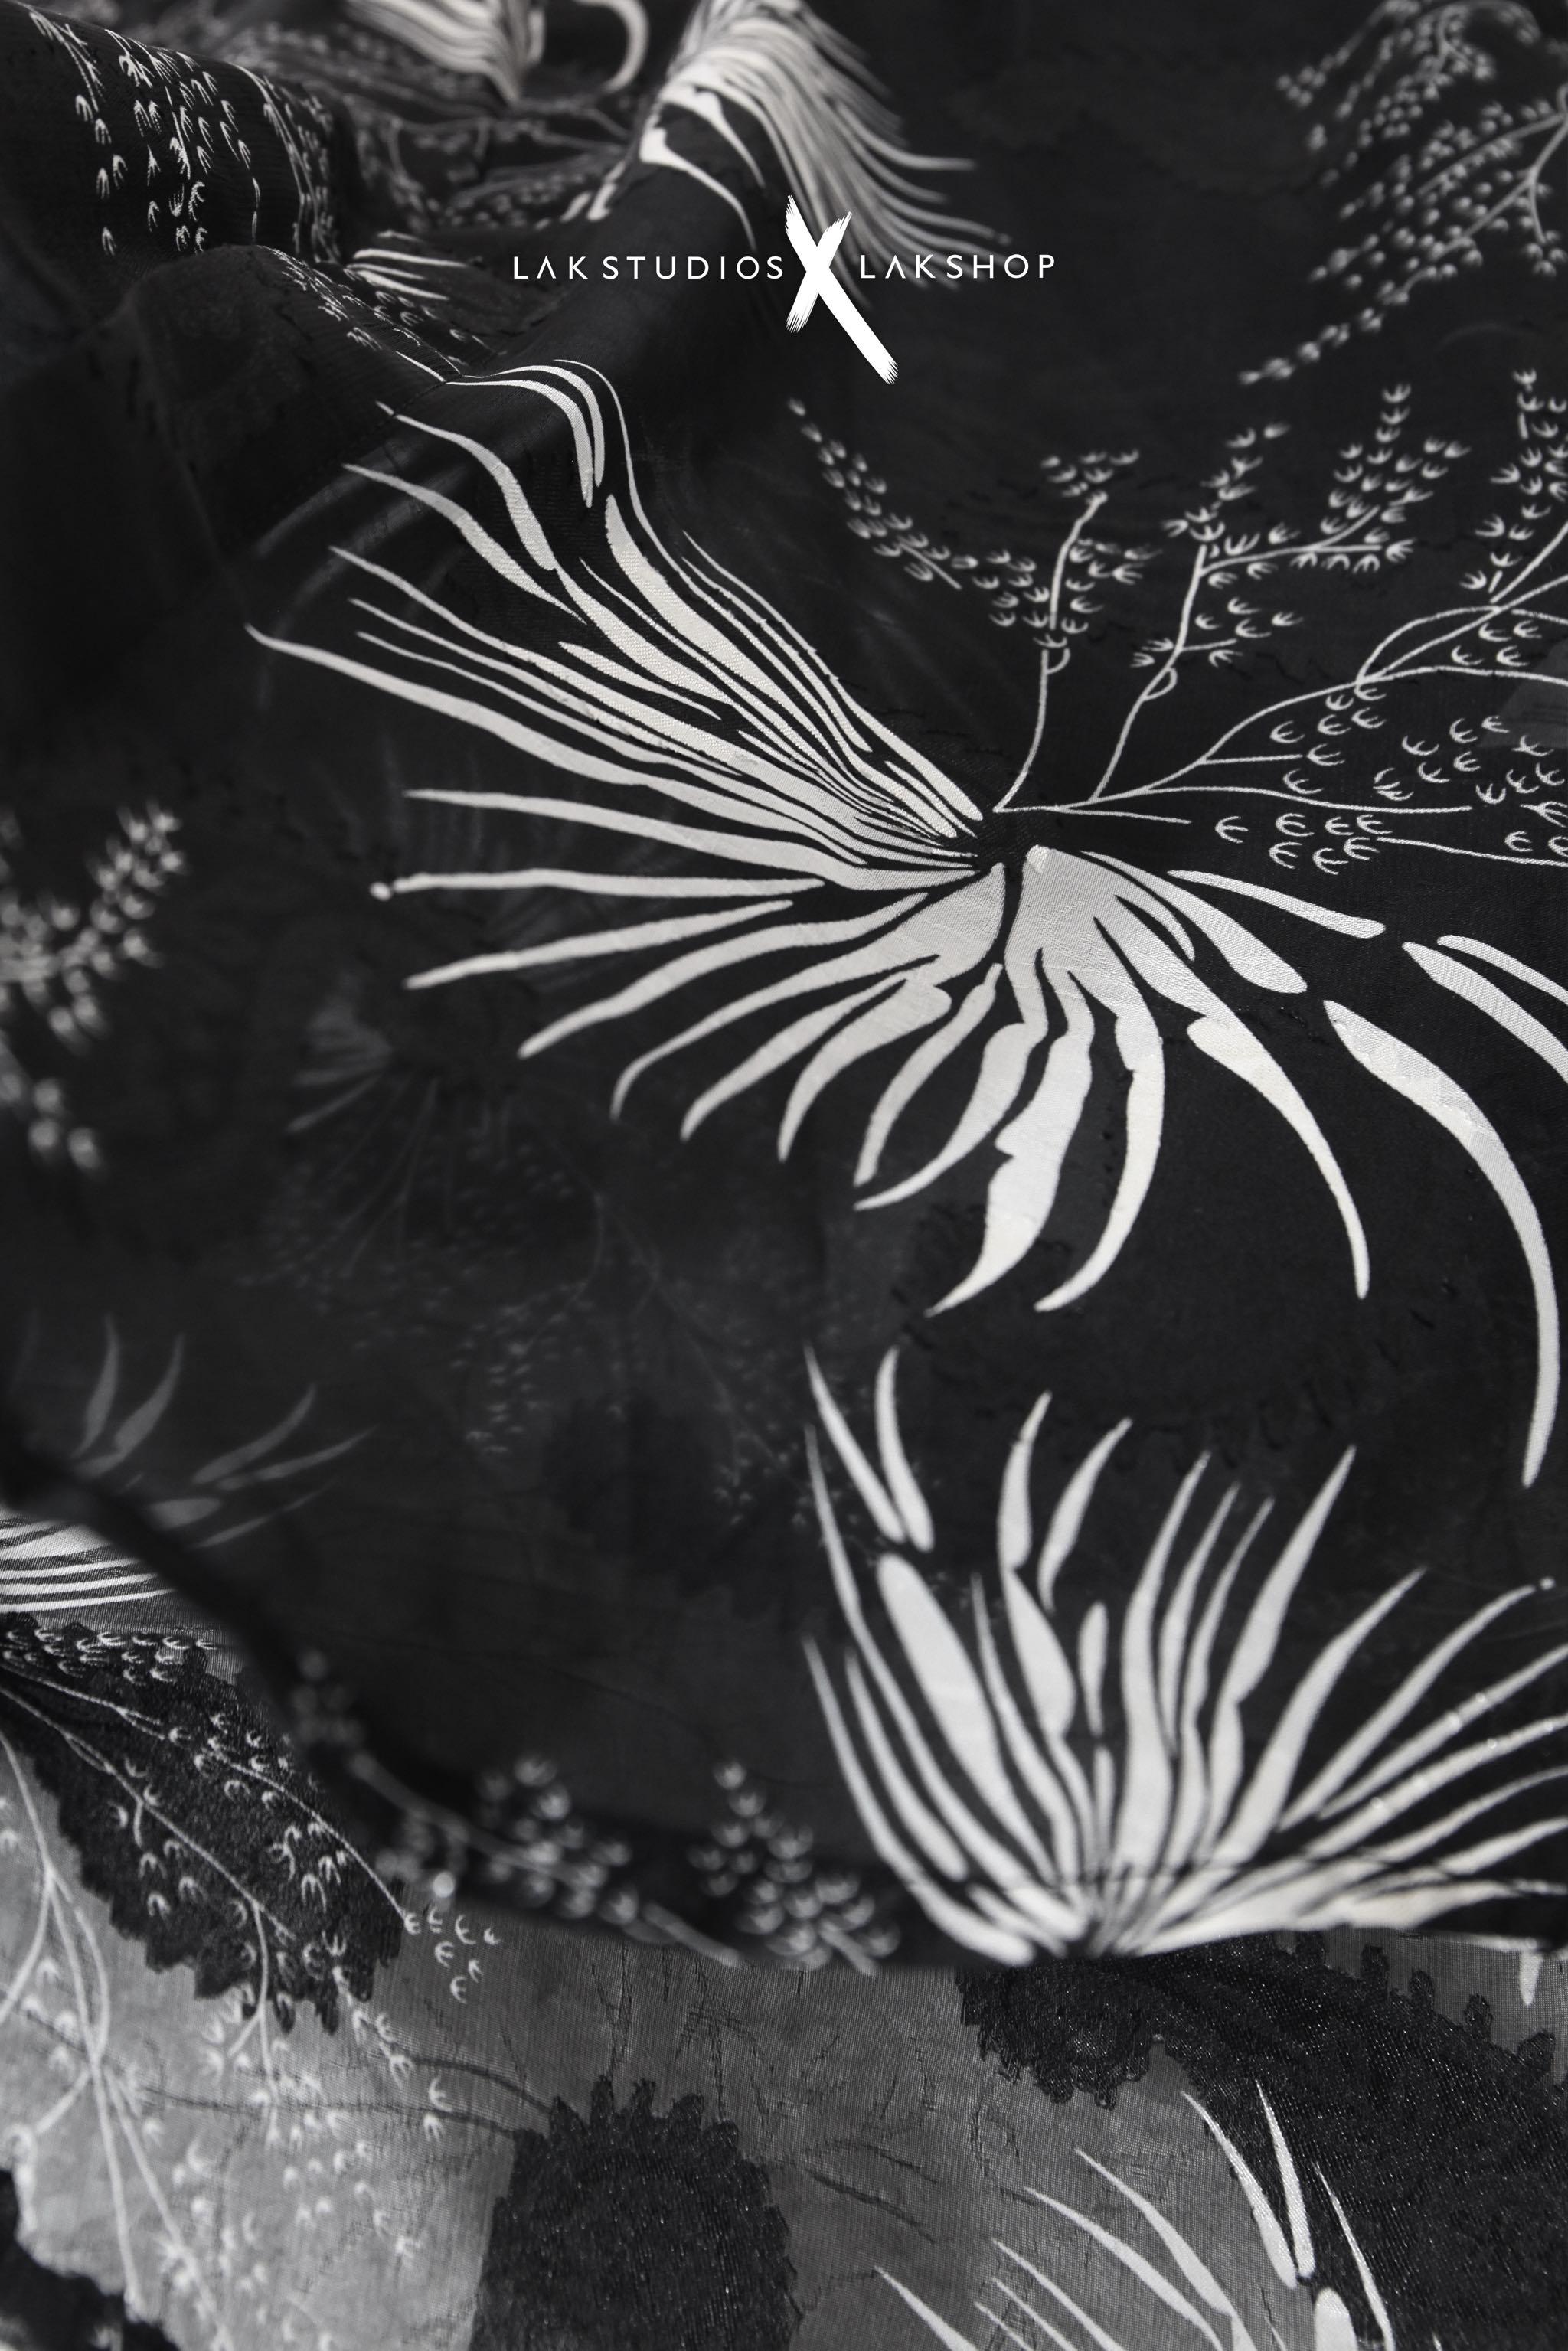 Lak Studios Flash Print Black Shirt